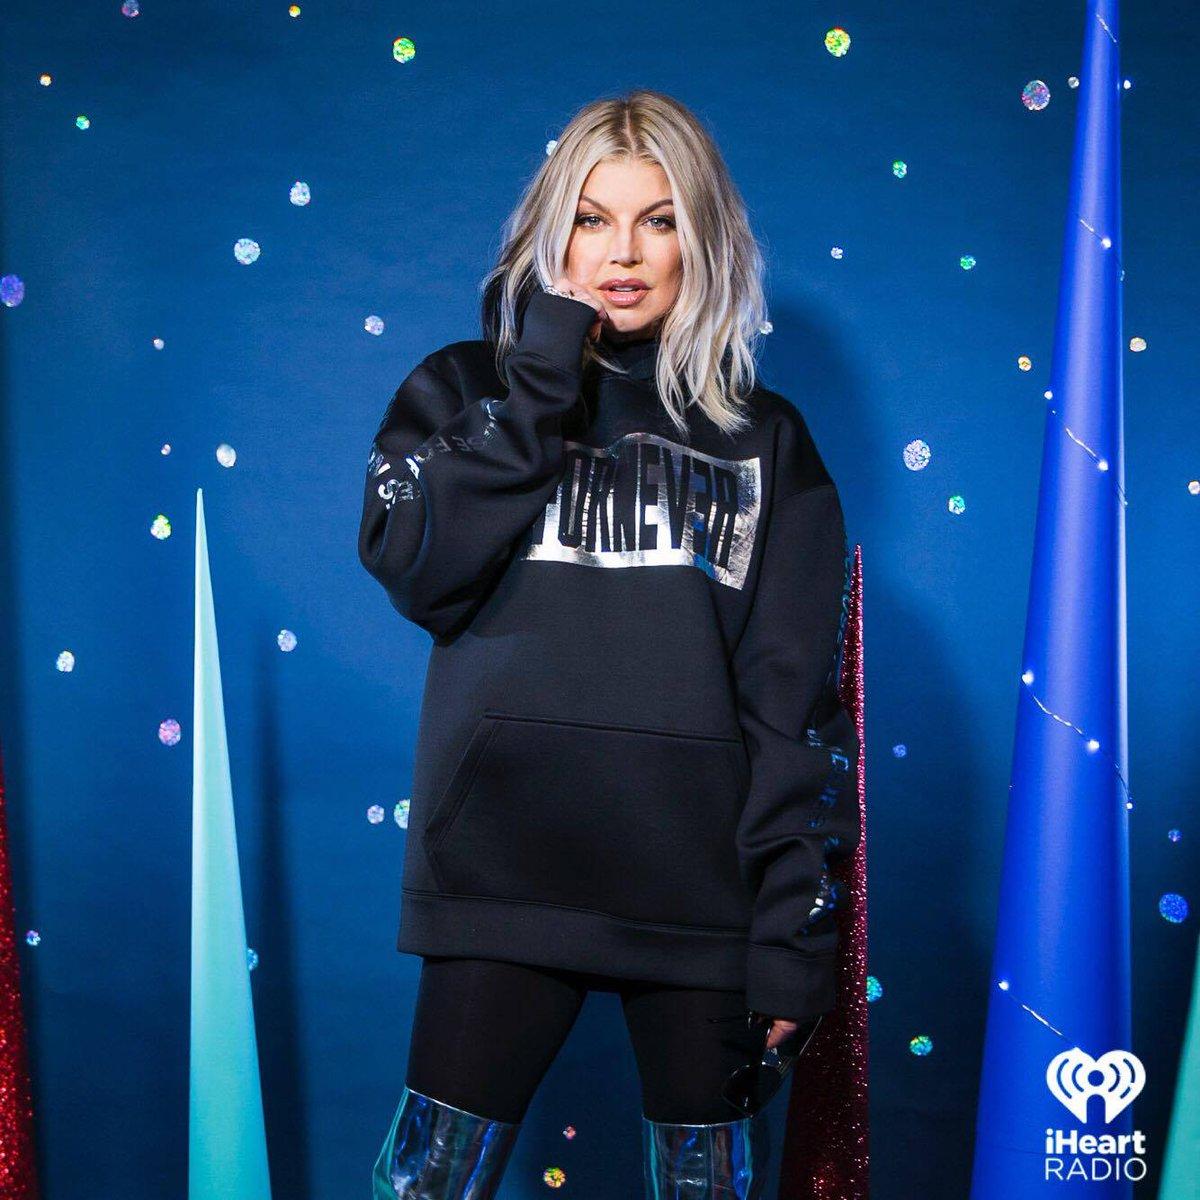 RT @iHeartRadioCA: All I want for Christmas is @Fergie #JingleBallNorth https://t.co/GD1qtqGsqc